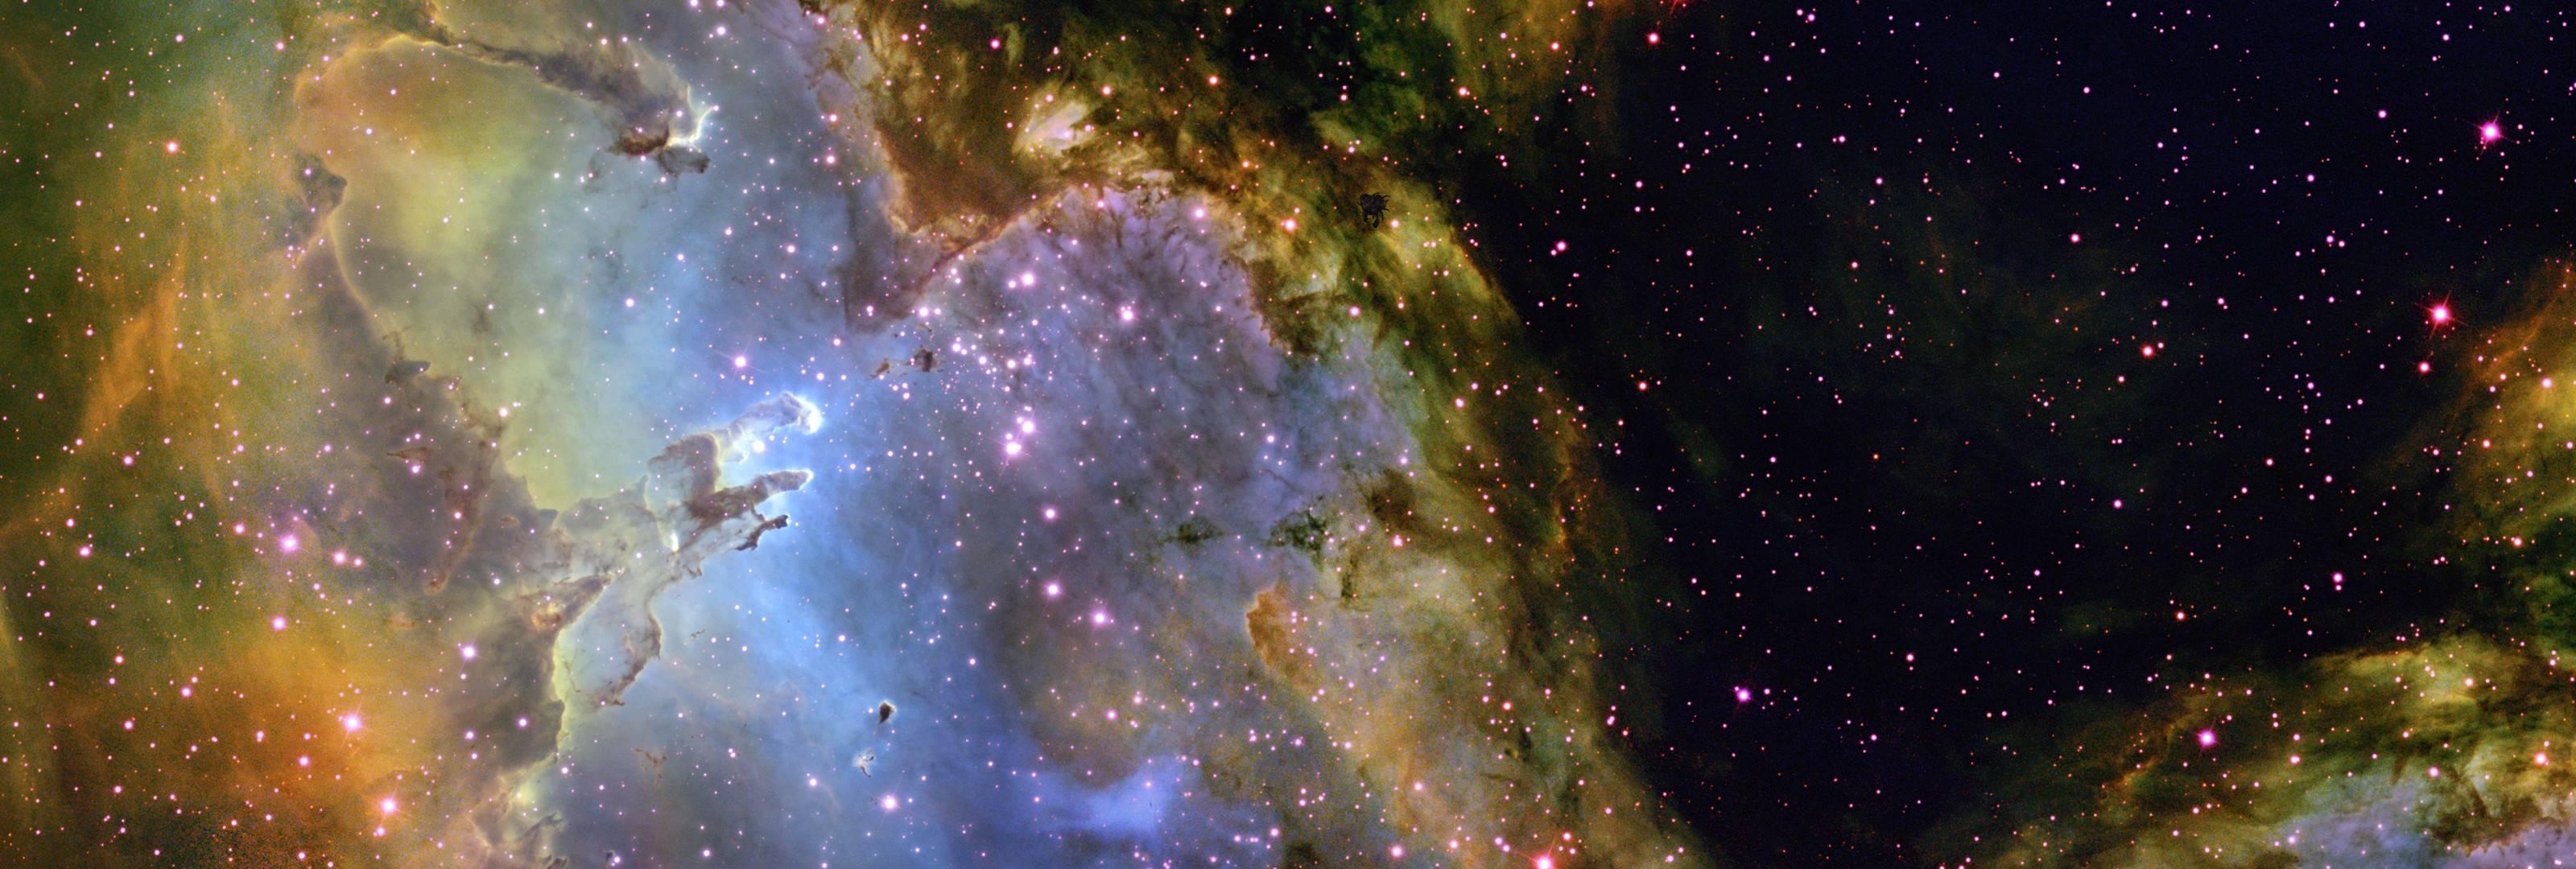 eagle nebula wallpaper hd - photo #17